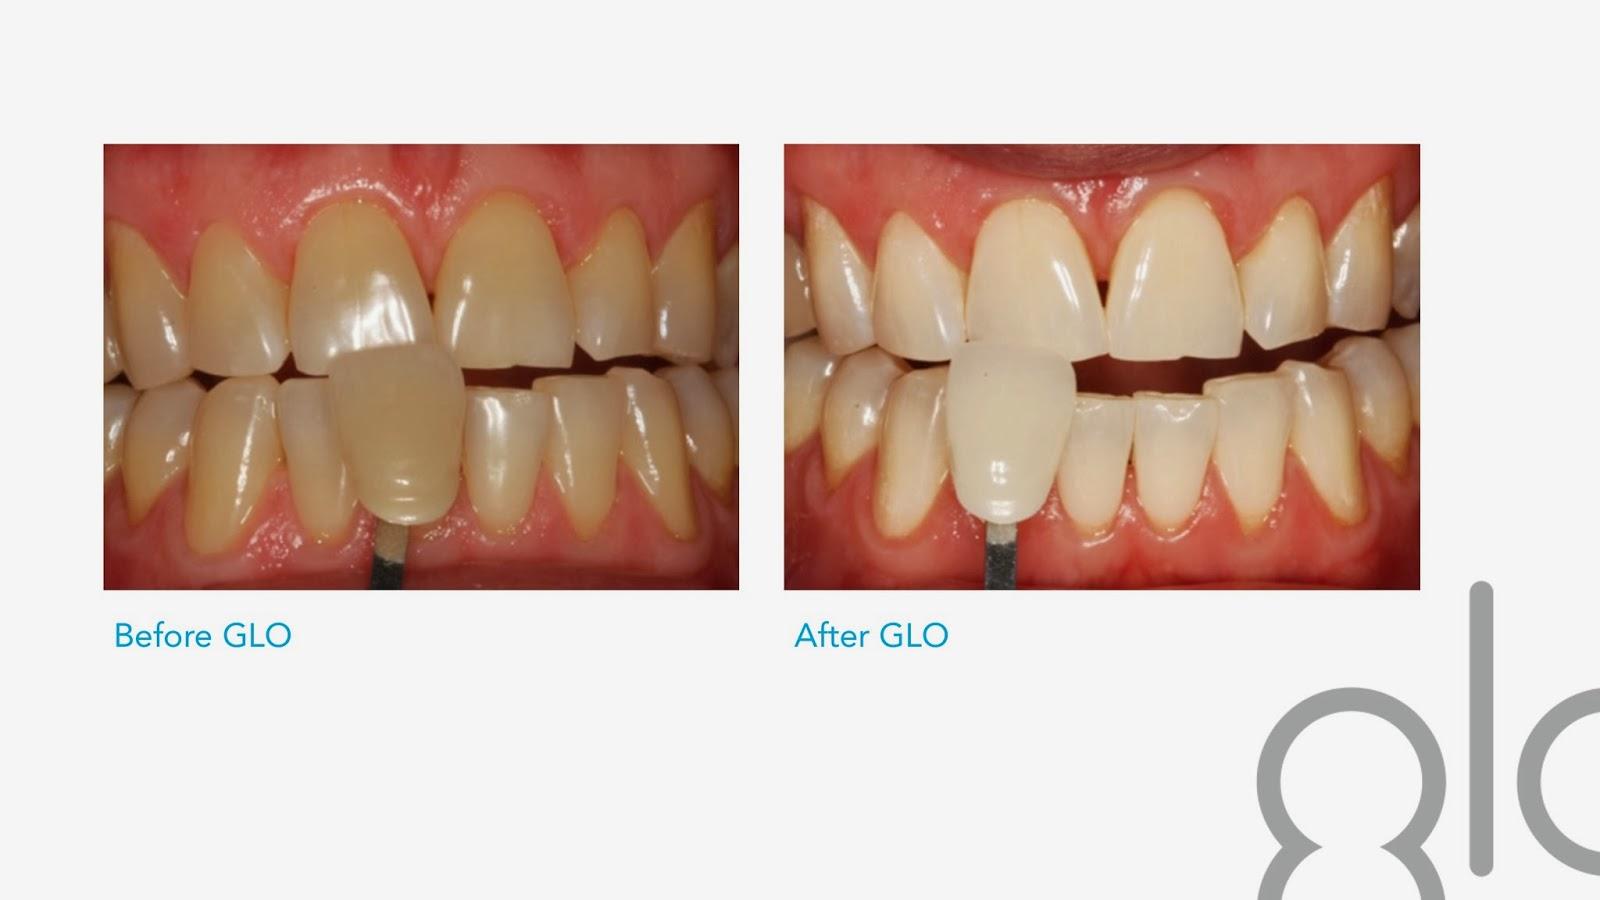 Union Hills Family Dentistry Dr Ethan Yoza